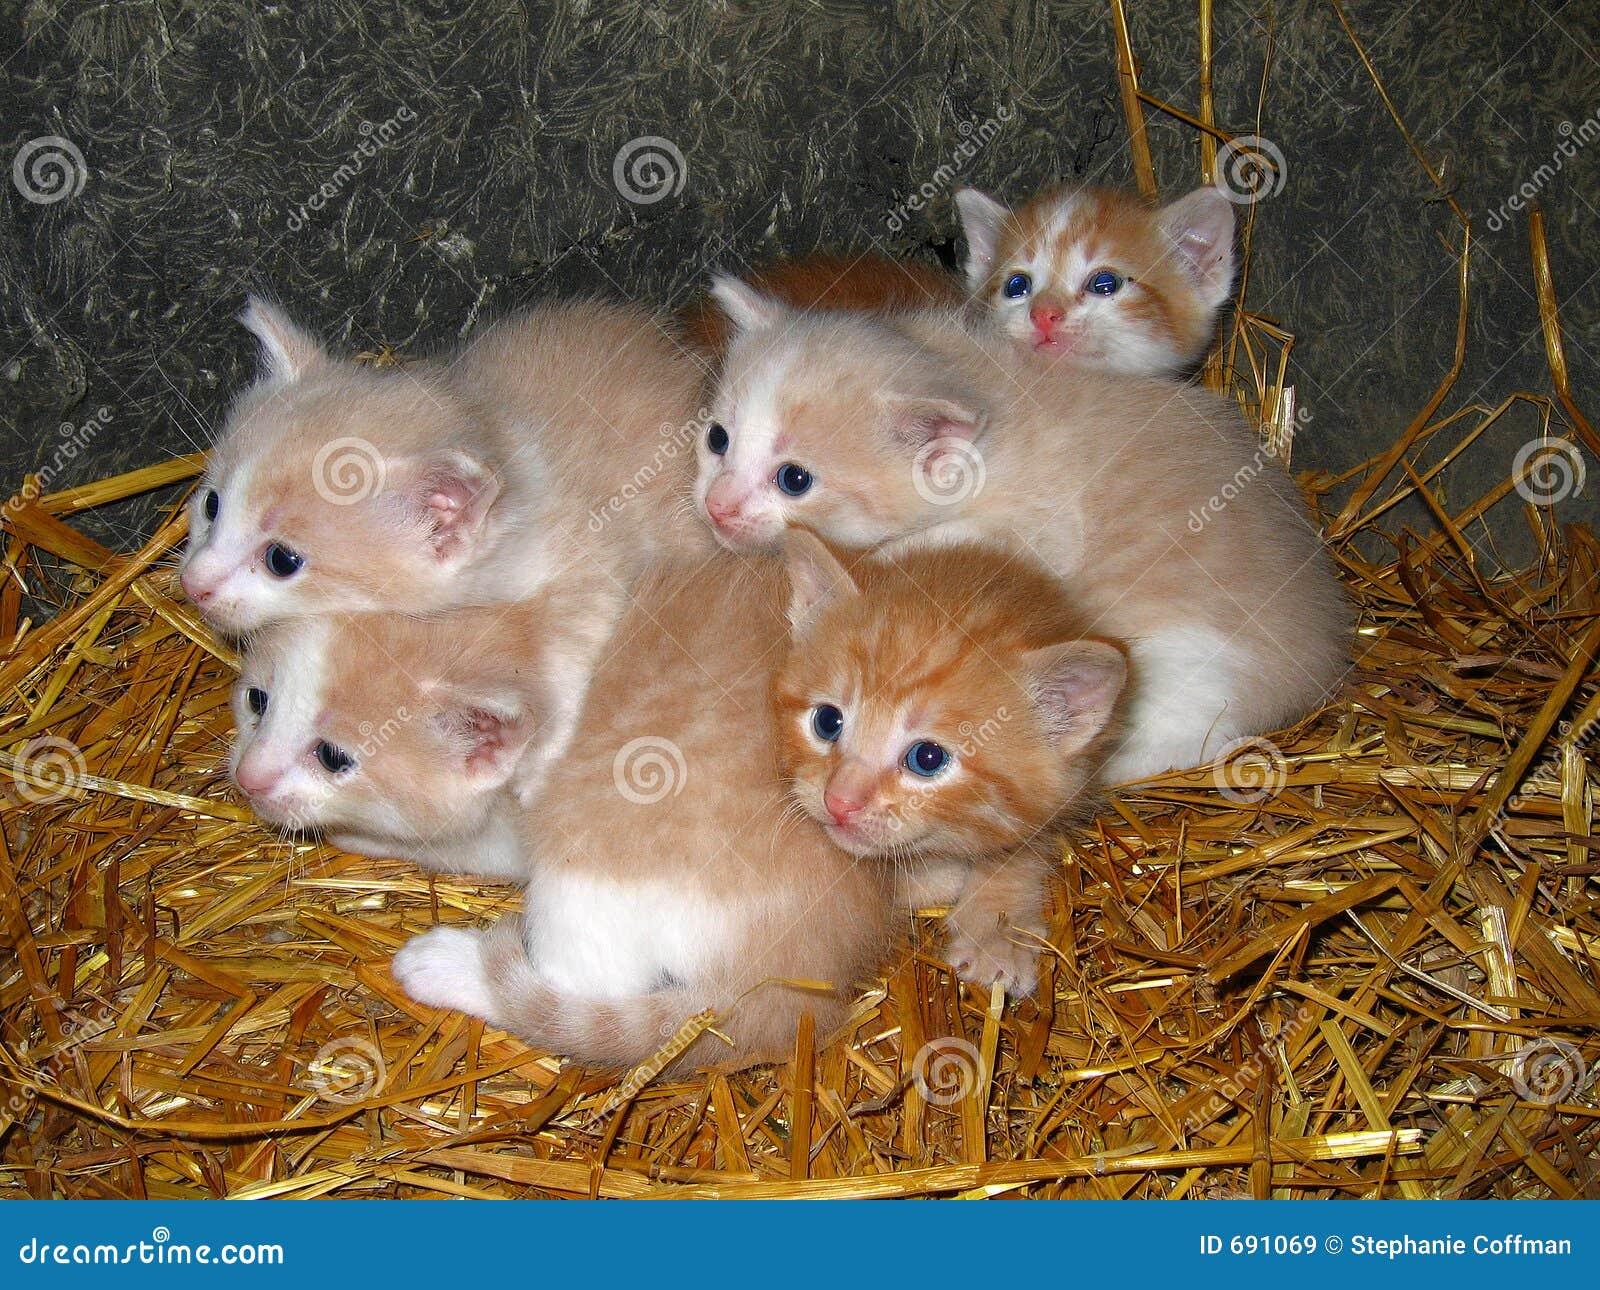 Imagens de Stock Royalty Free: Gatinhos amarelos